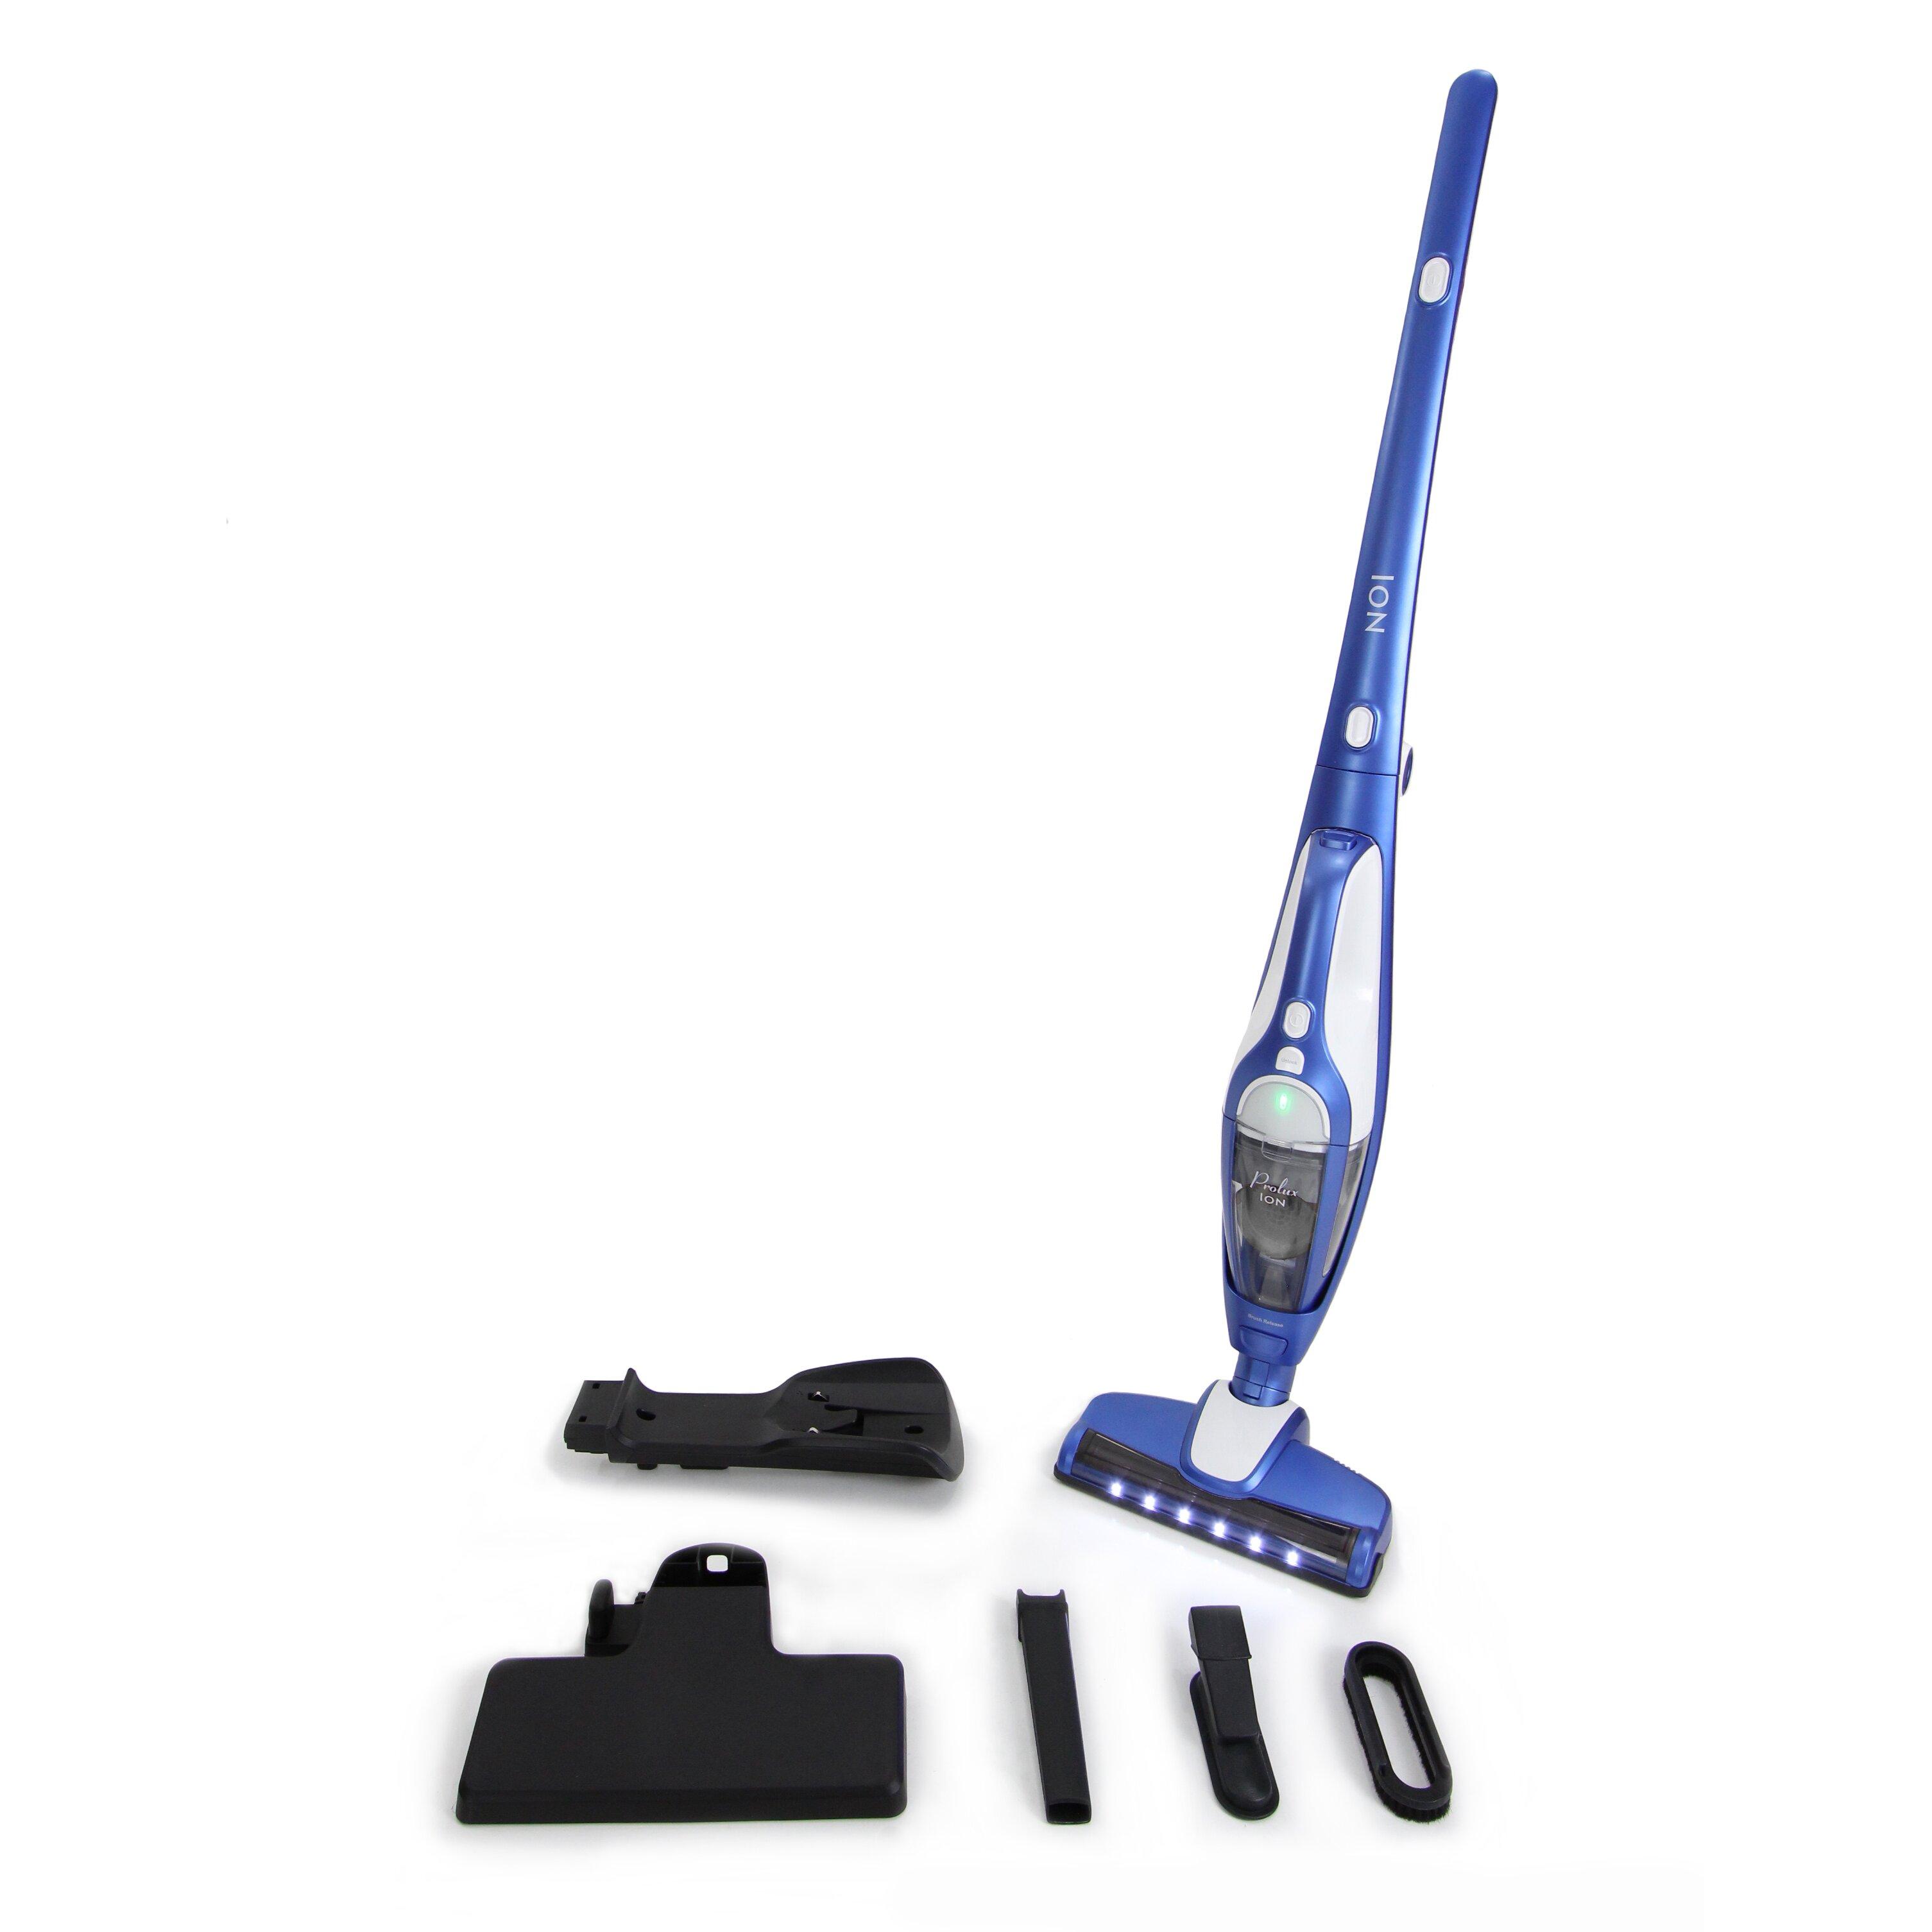 Images of Bagless Stick Vacuum. Owner's Manual ...